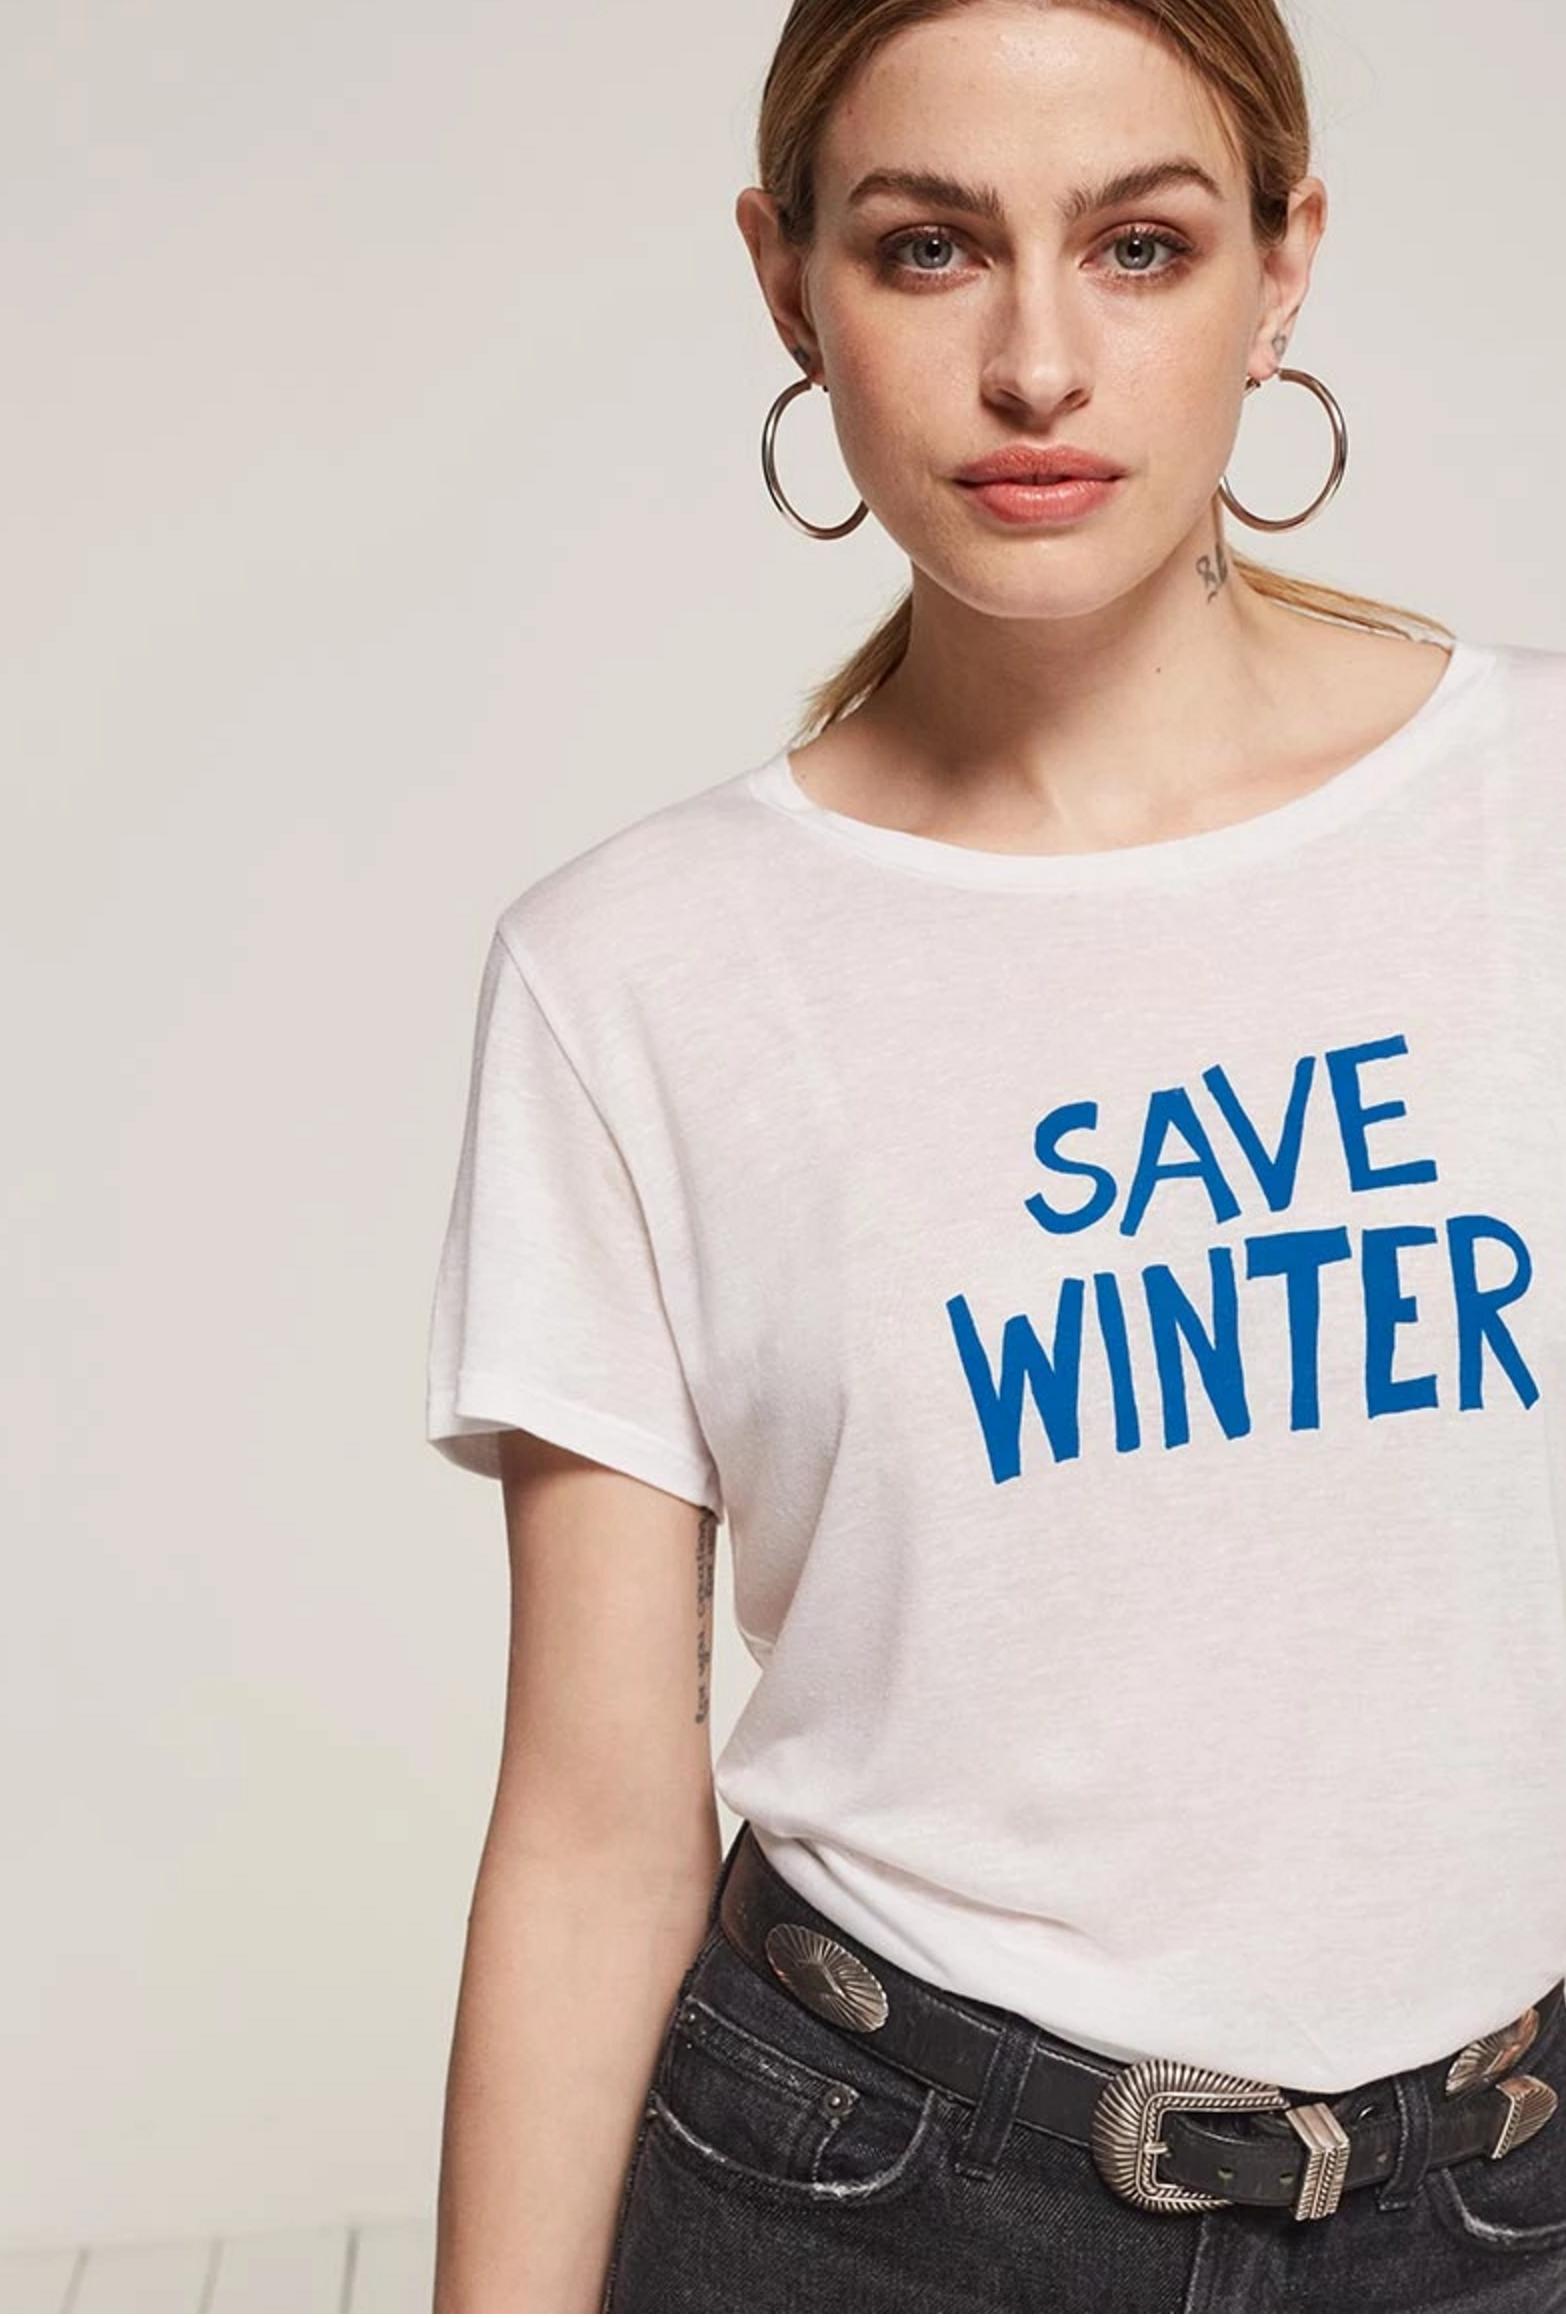 Save Winter